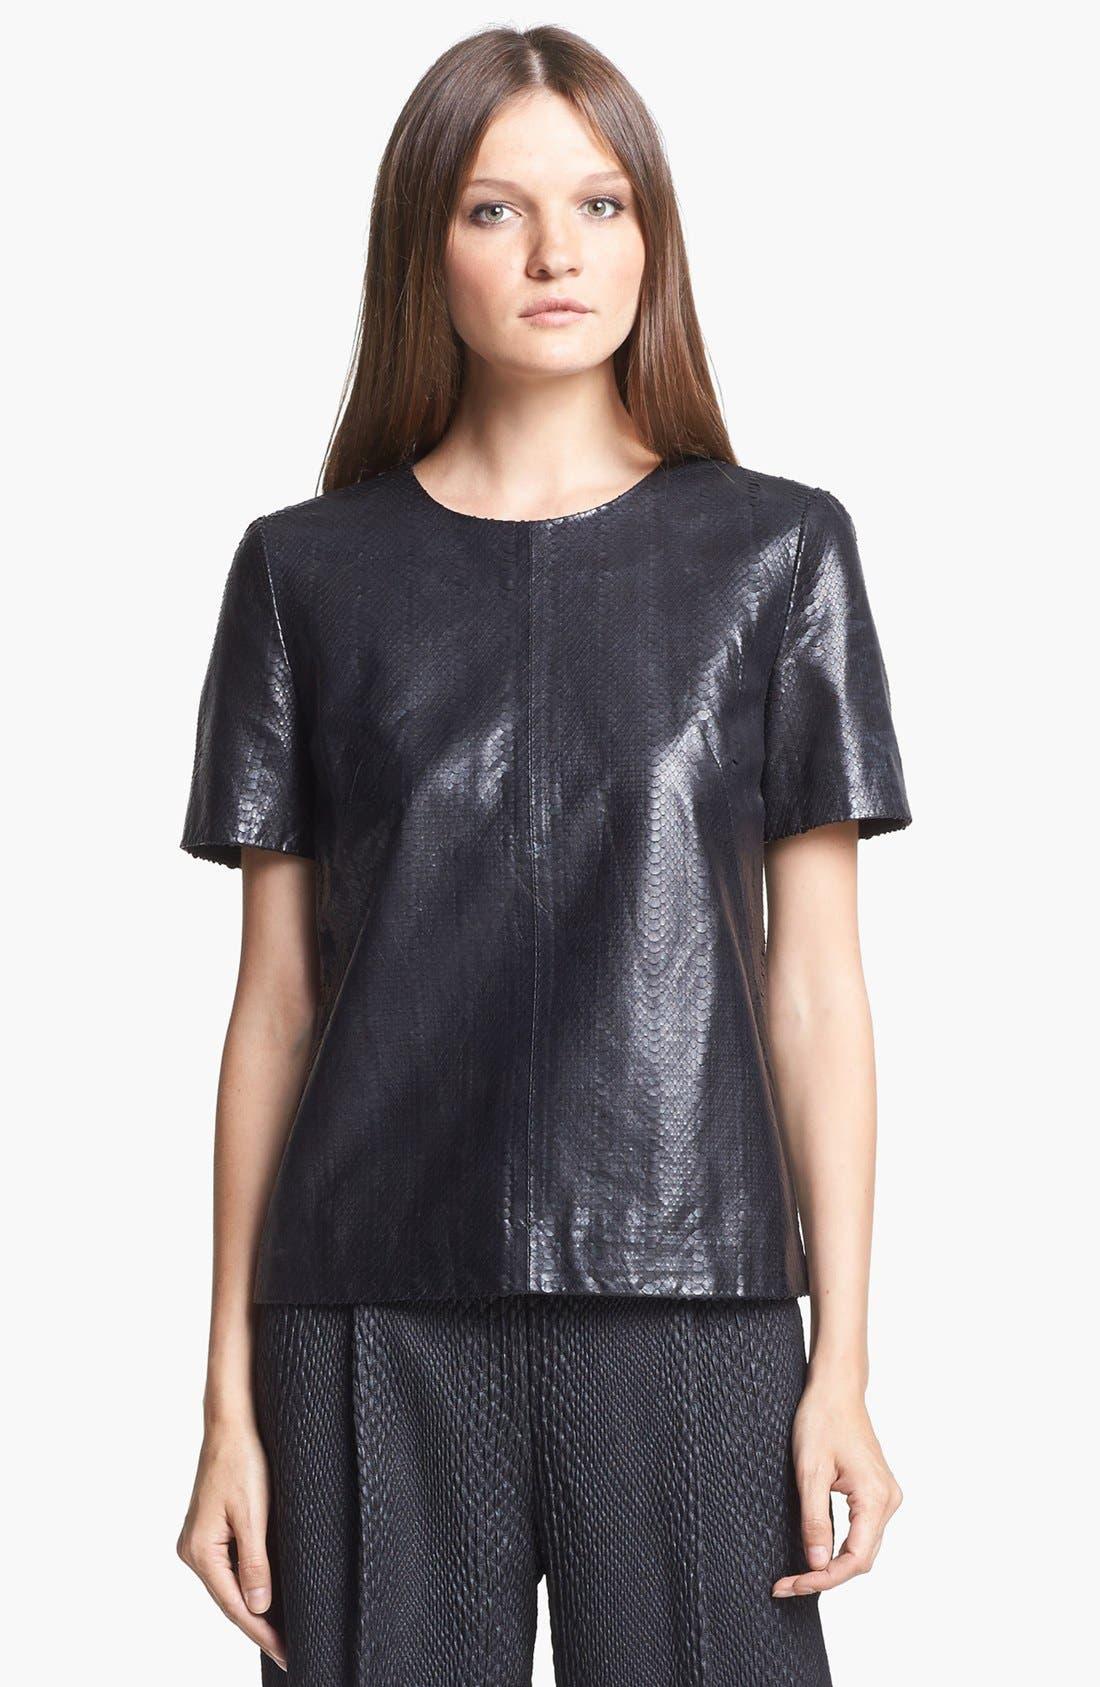 Main Image - J Brand Ready-to-Wear 'Marilena' Leather Tee